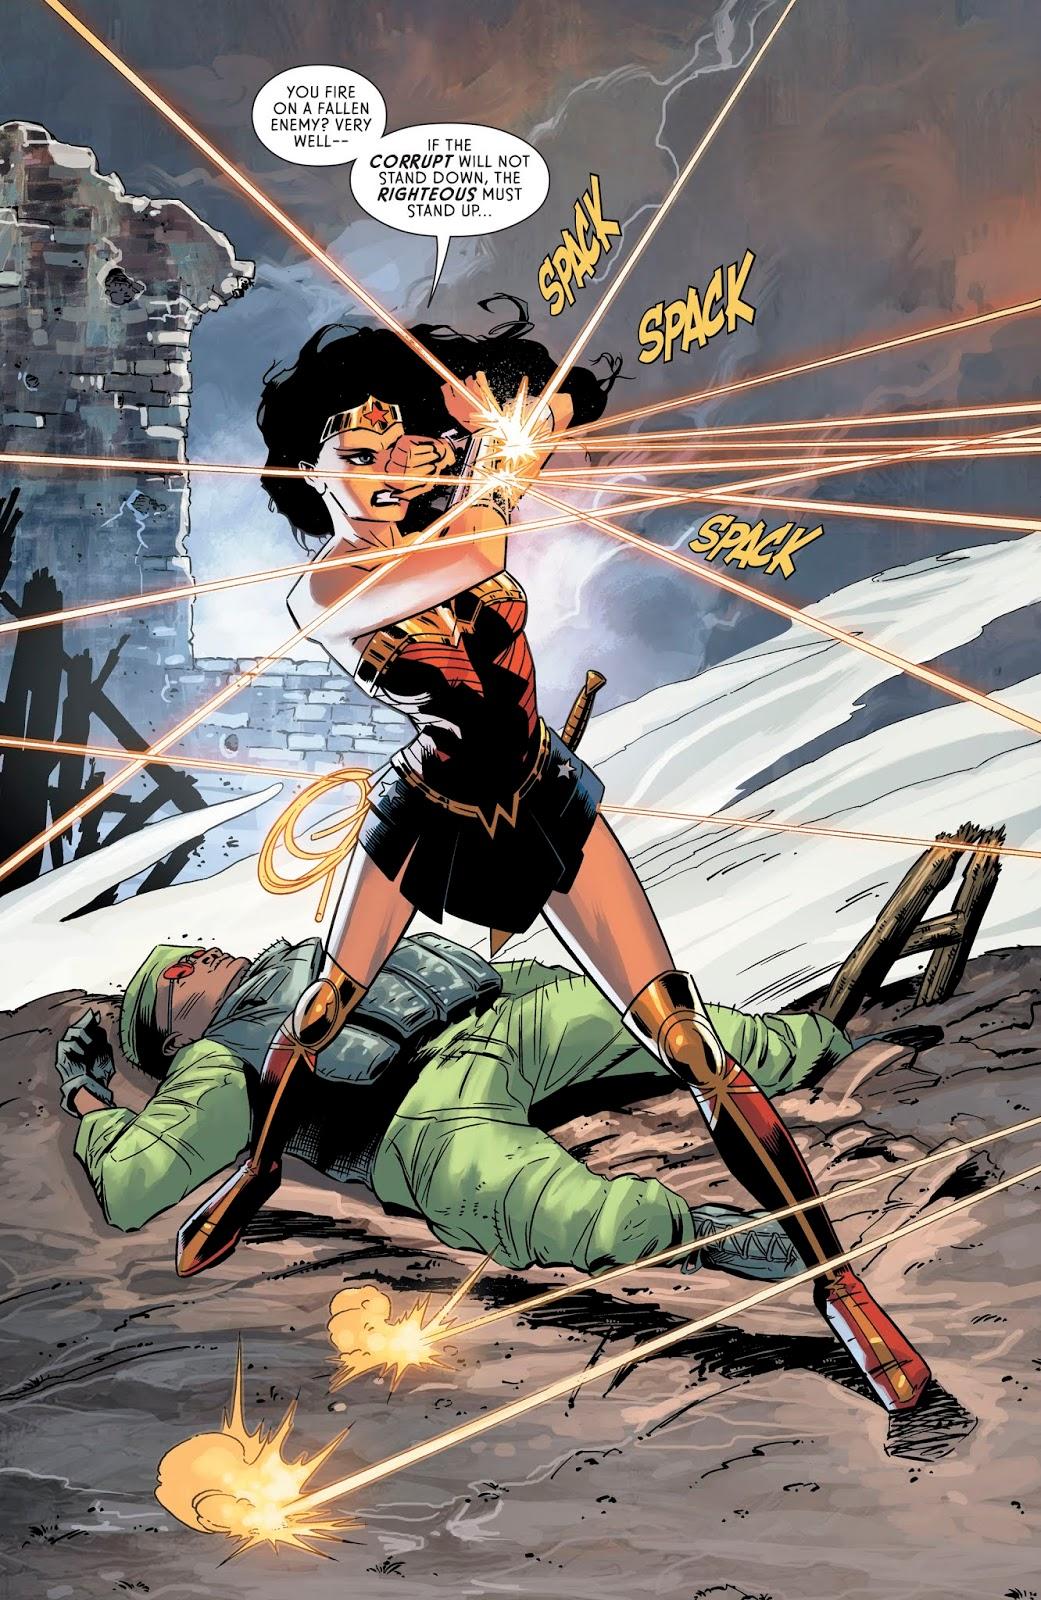 Wonder Woman Vol. 5 #60